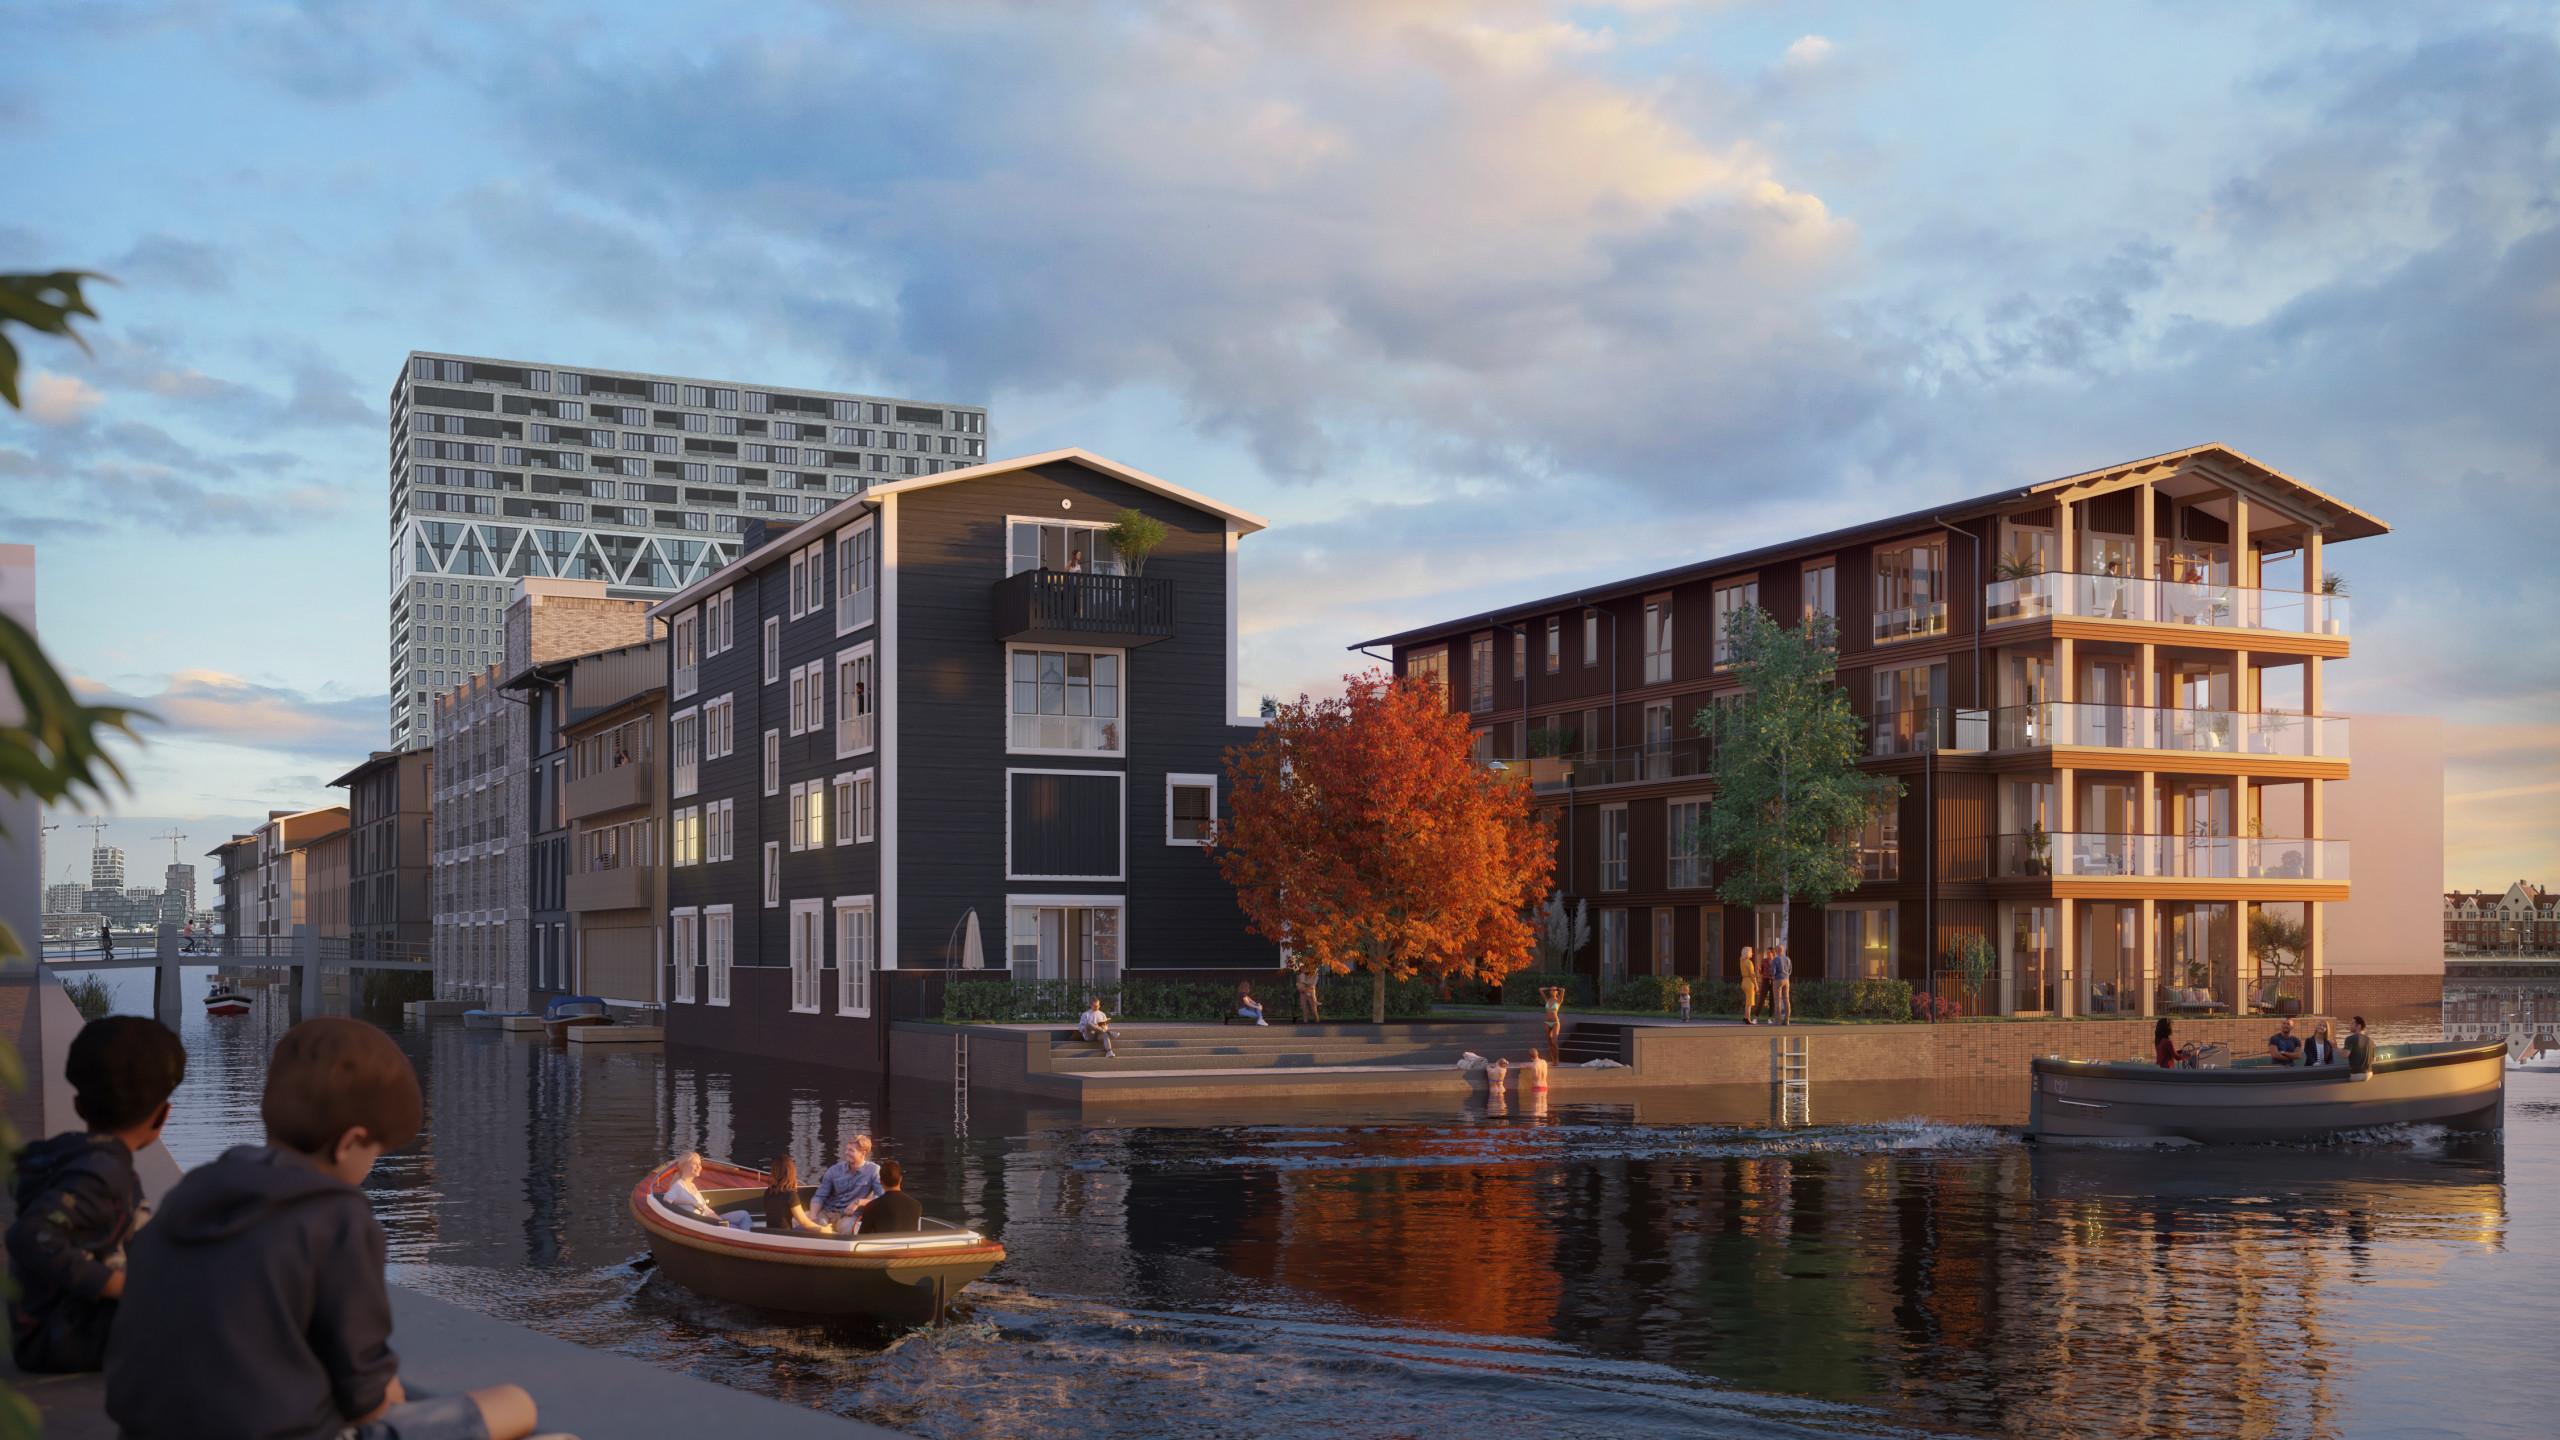 Beeldenfabriek - Libau eiland Amsterdam